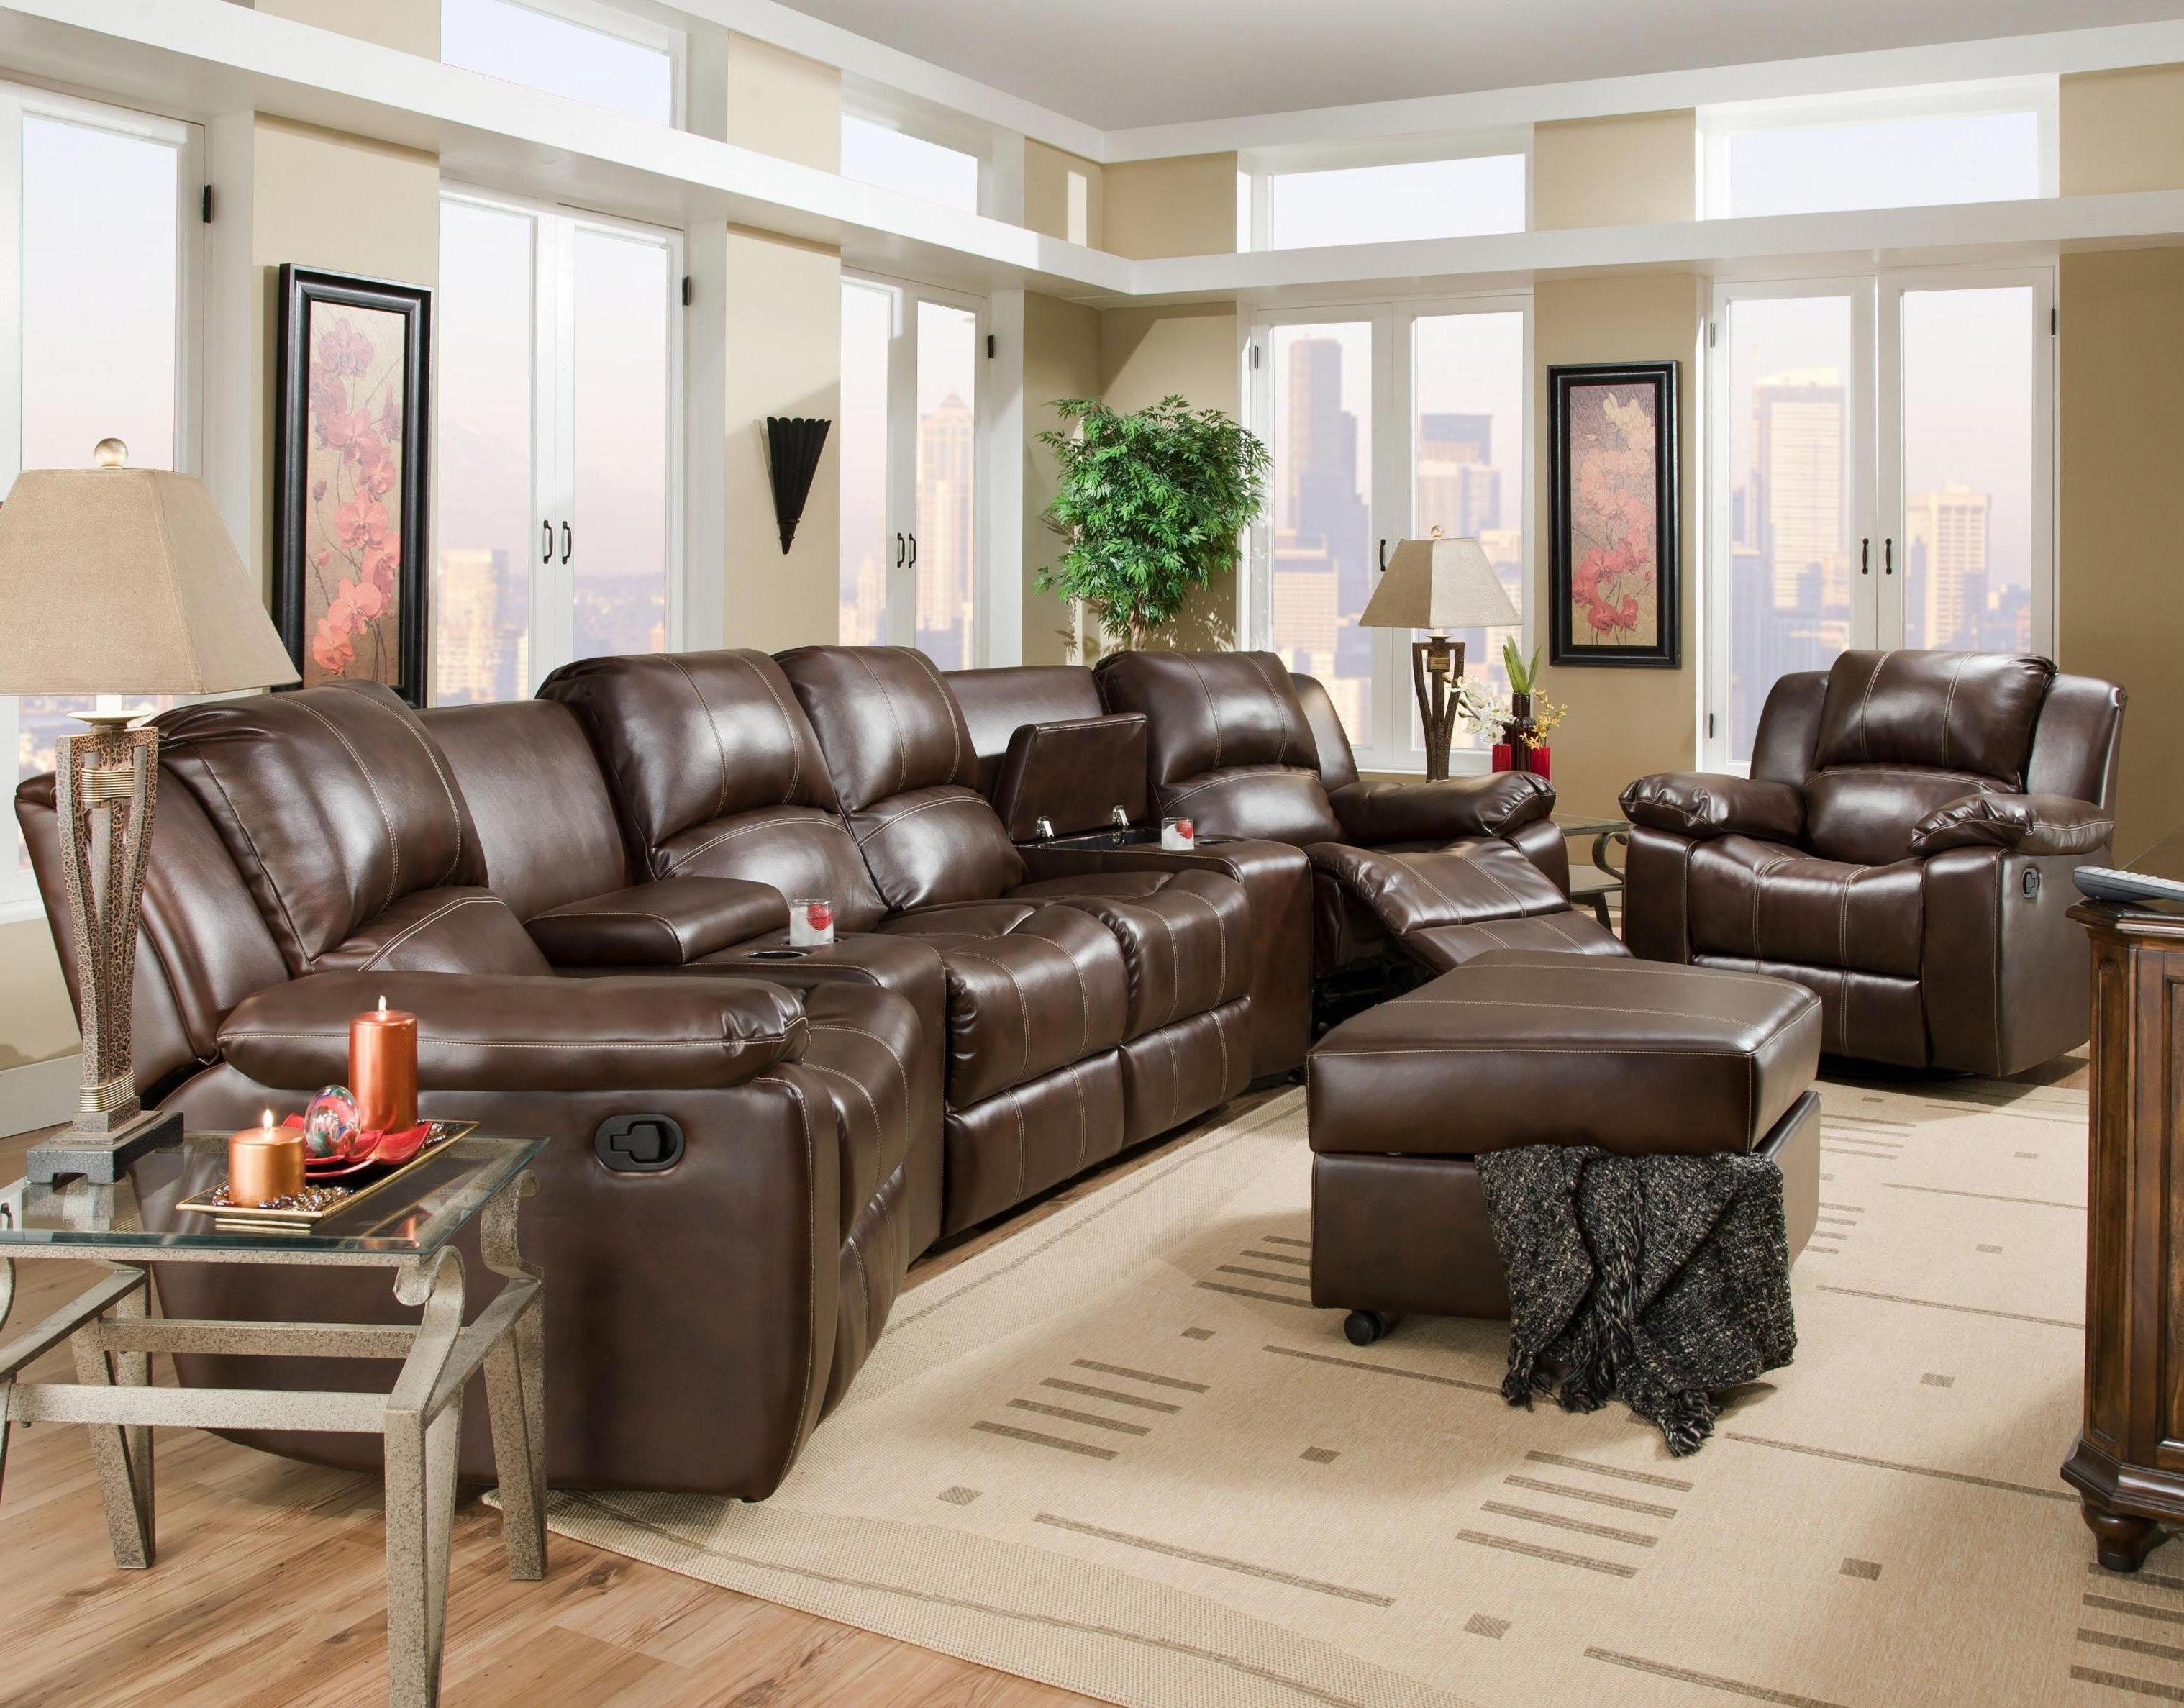 Trendy Belfort Furniture Reviews Reclining Sectional Sofas Washington Dc Regarding Virginia Sectional Sofas (View 15 of 20)